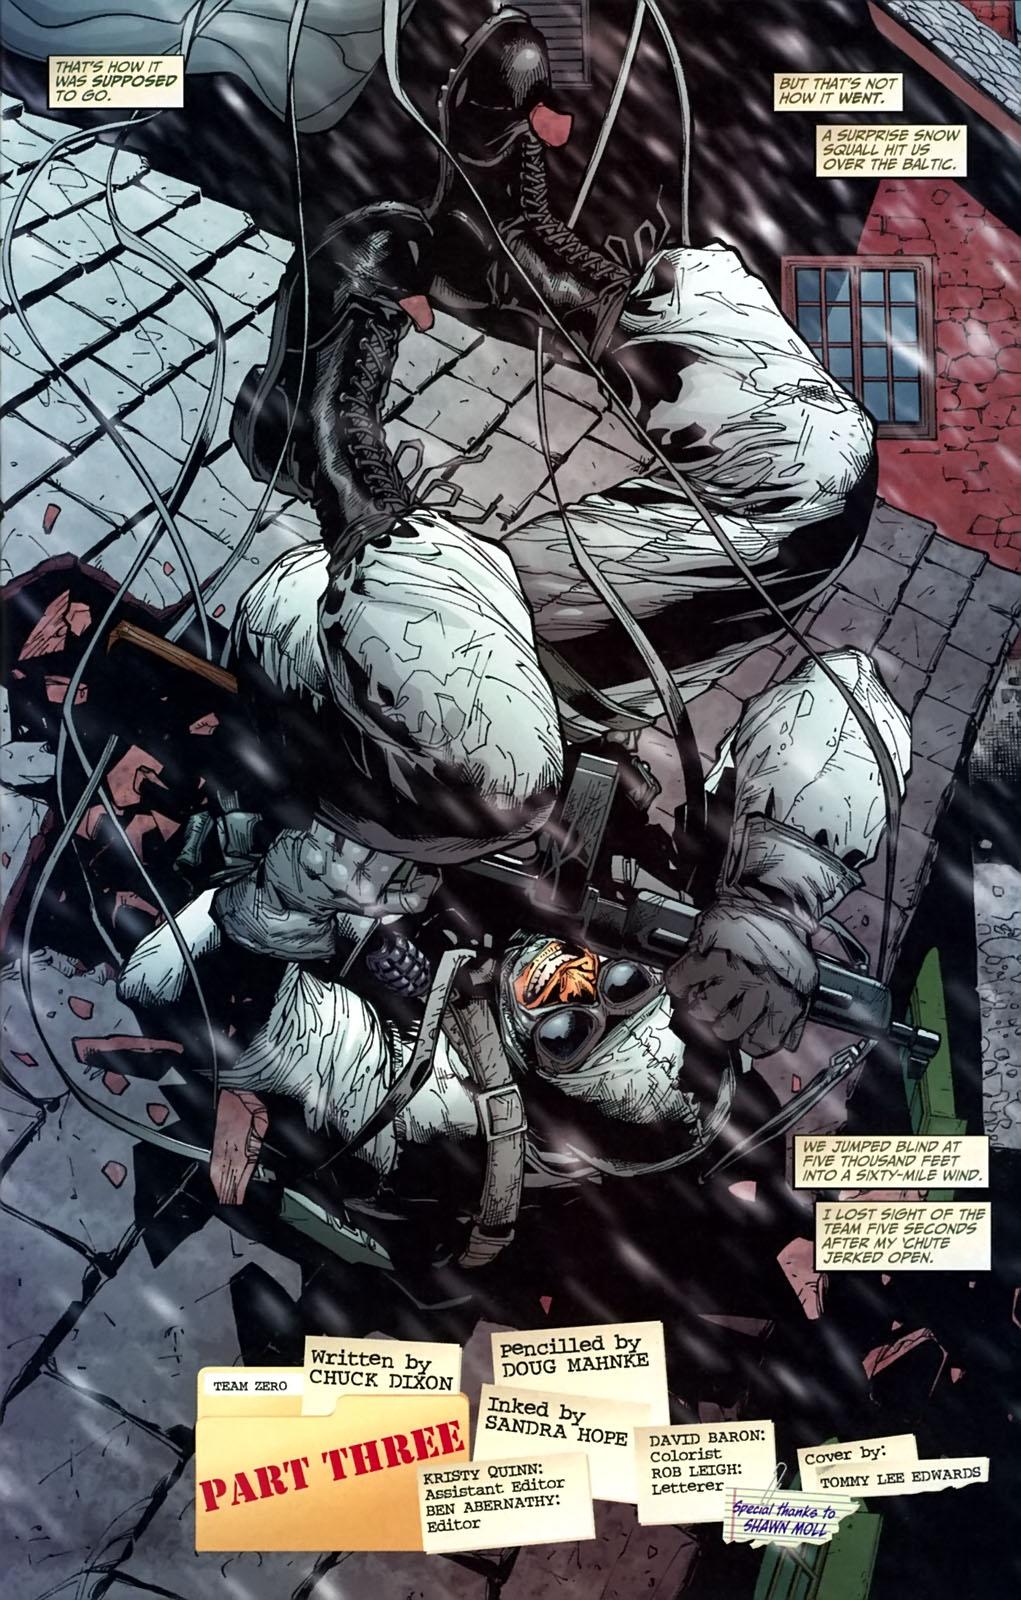 Read online Team Zero comic -  Issue #3 - 4